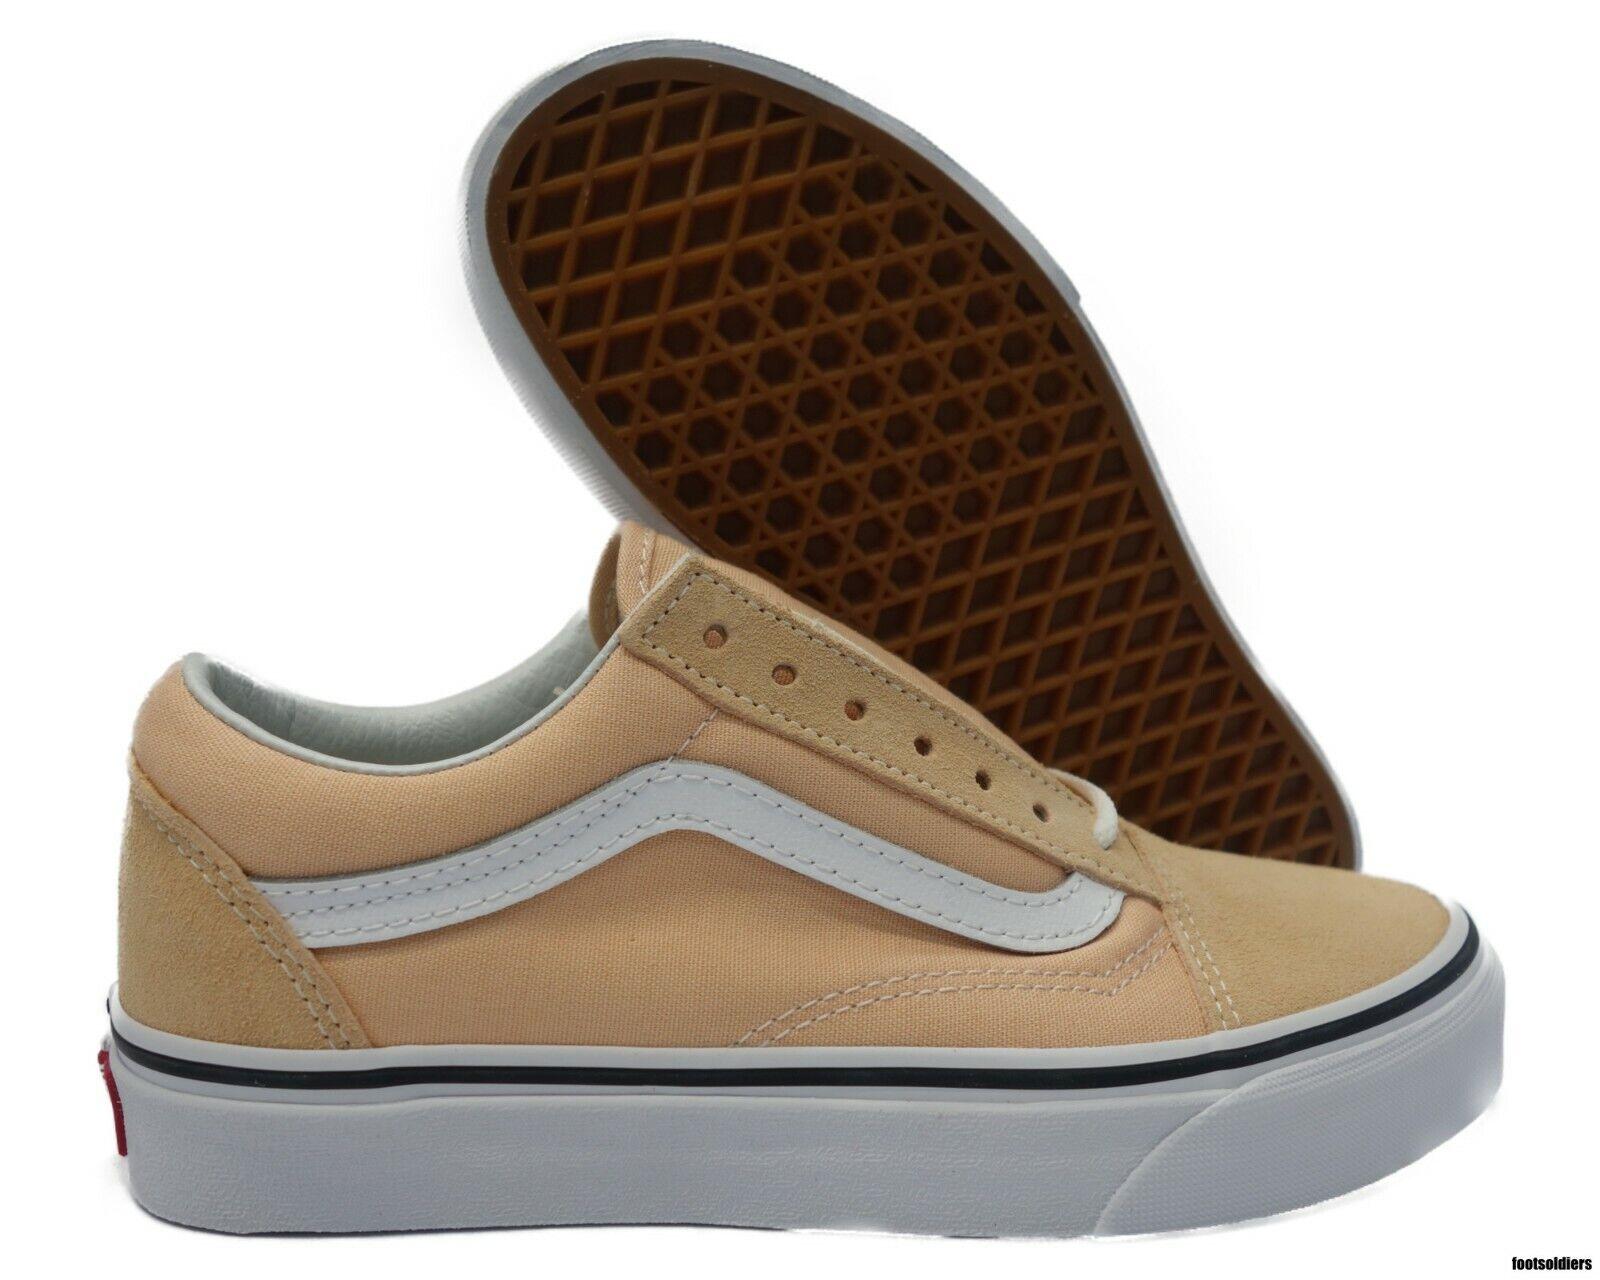 VN0A38G1U5Y Vans Old Skool (Bleached Apricot   White) Men Size 10